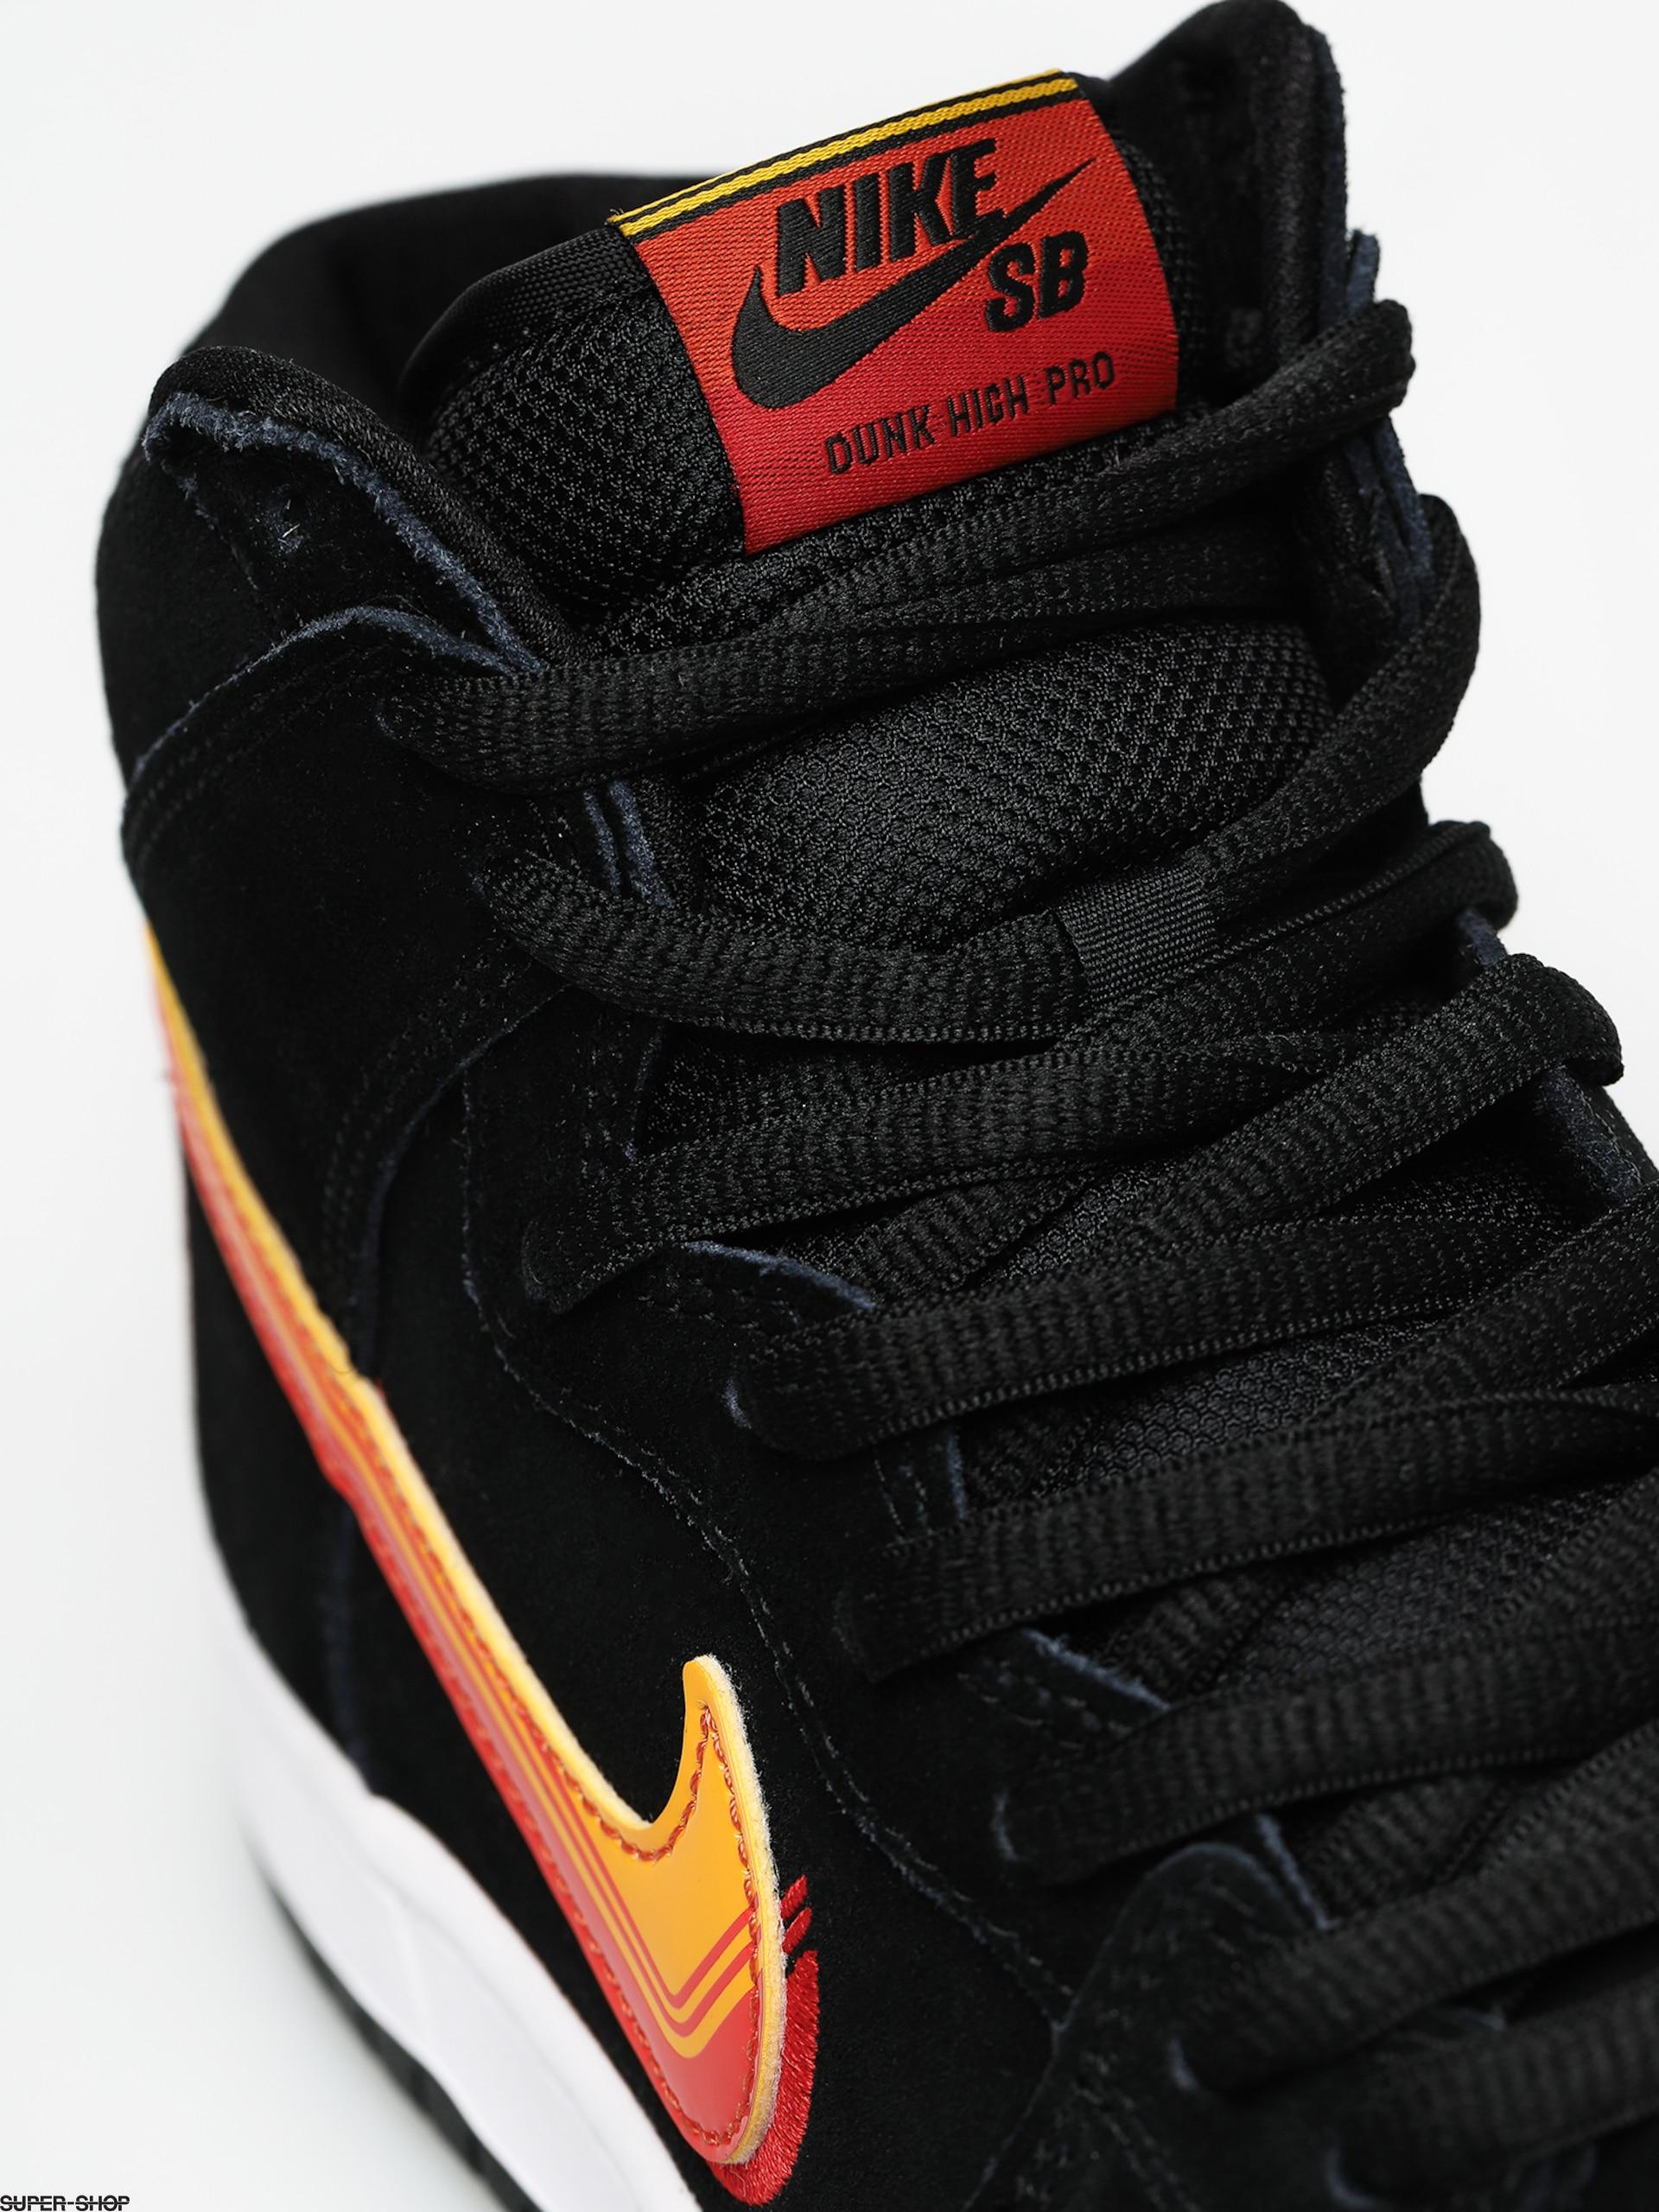 Team Gold & Black & White Nike Free